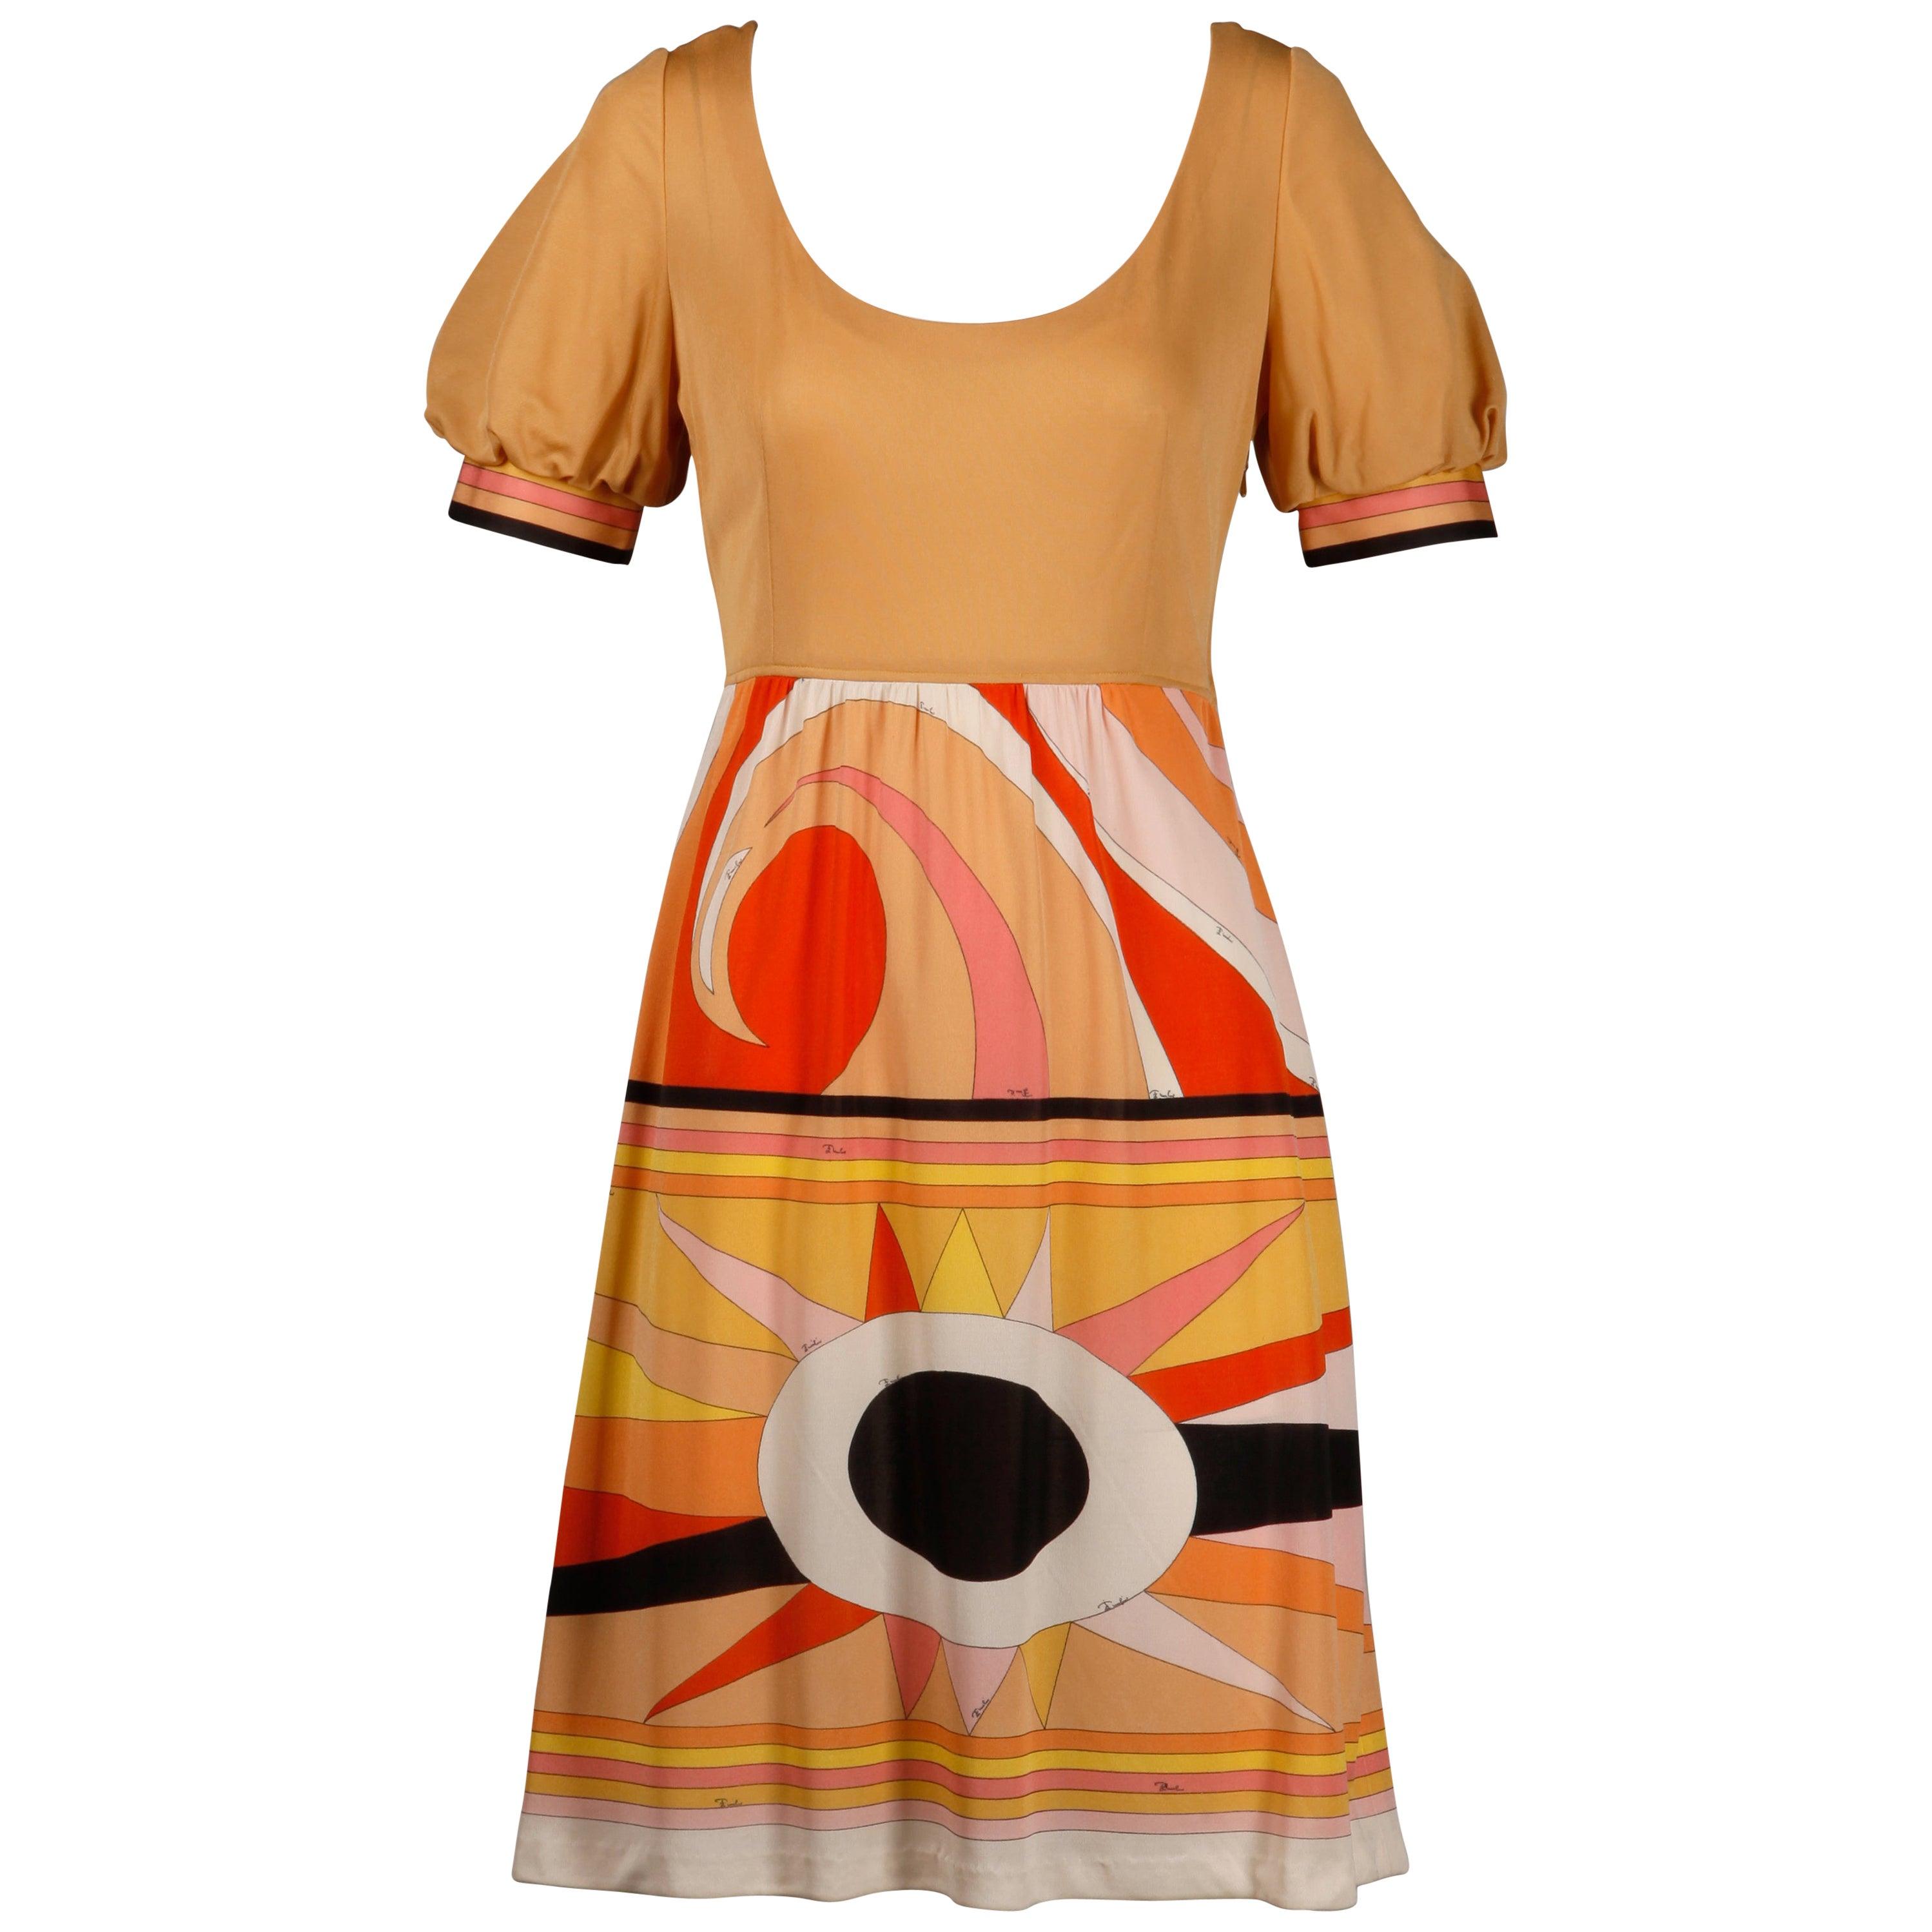 1970s Vintage Emilio Pucci Silk Jersey Knit Dress- Signed